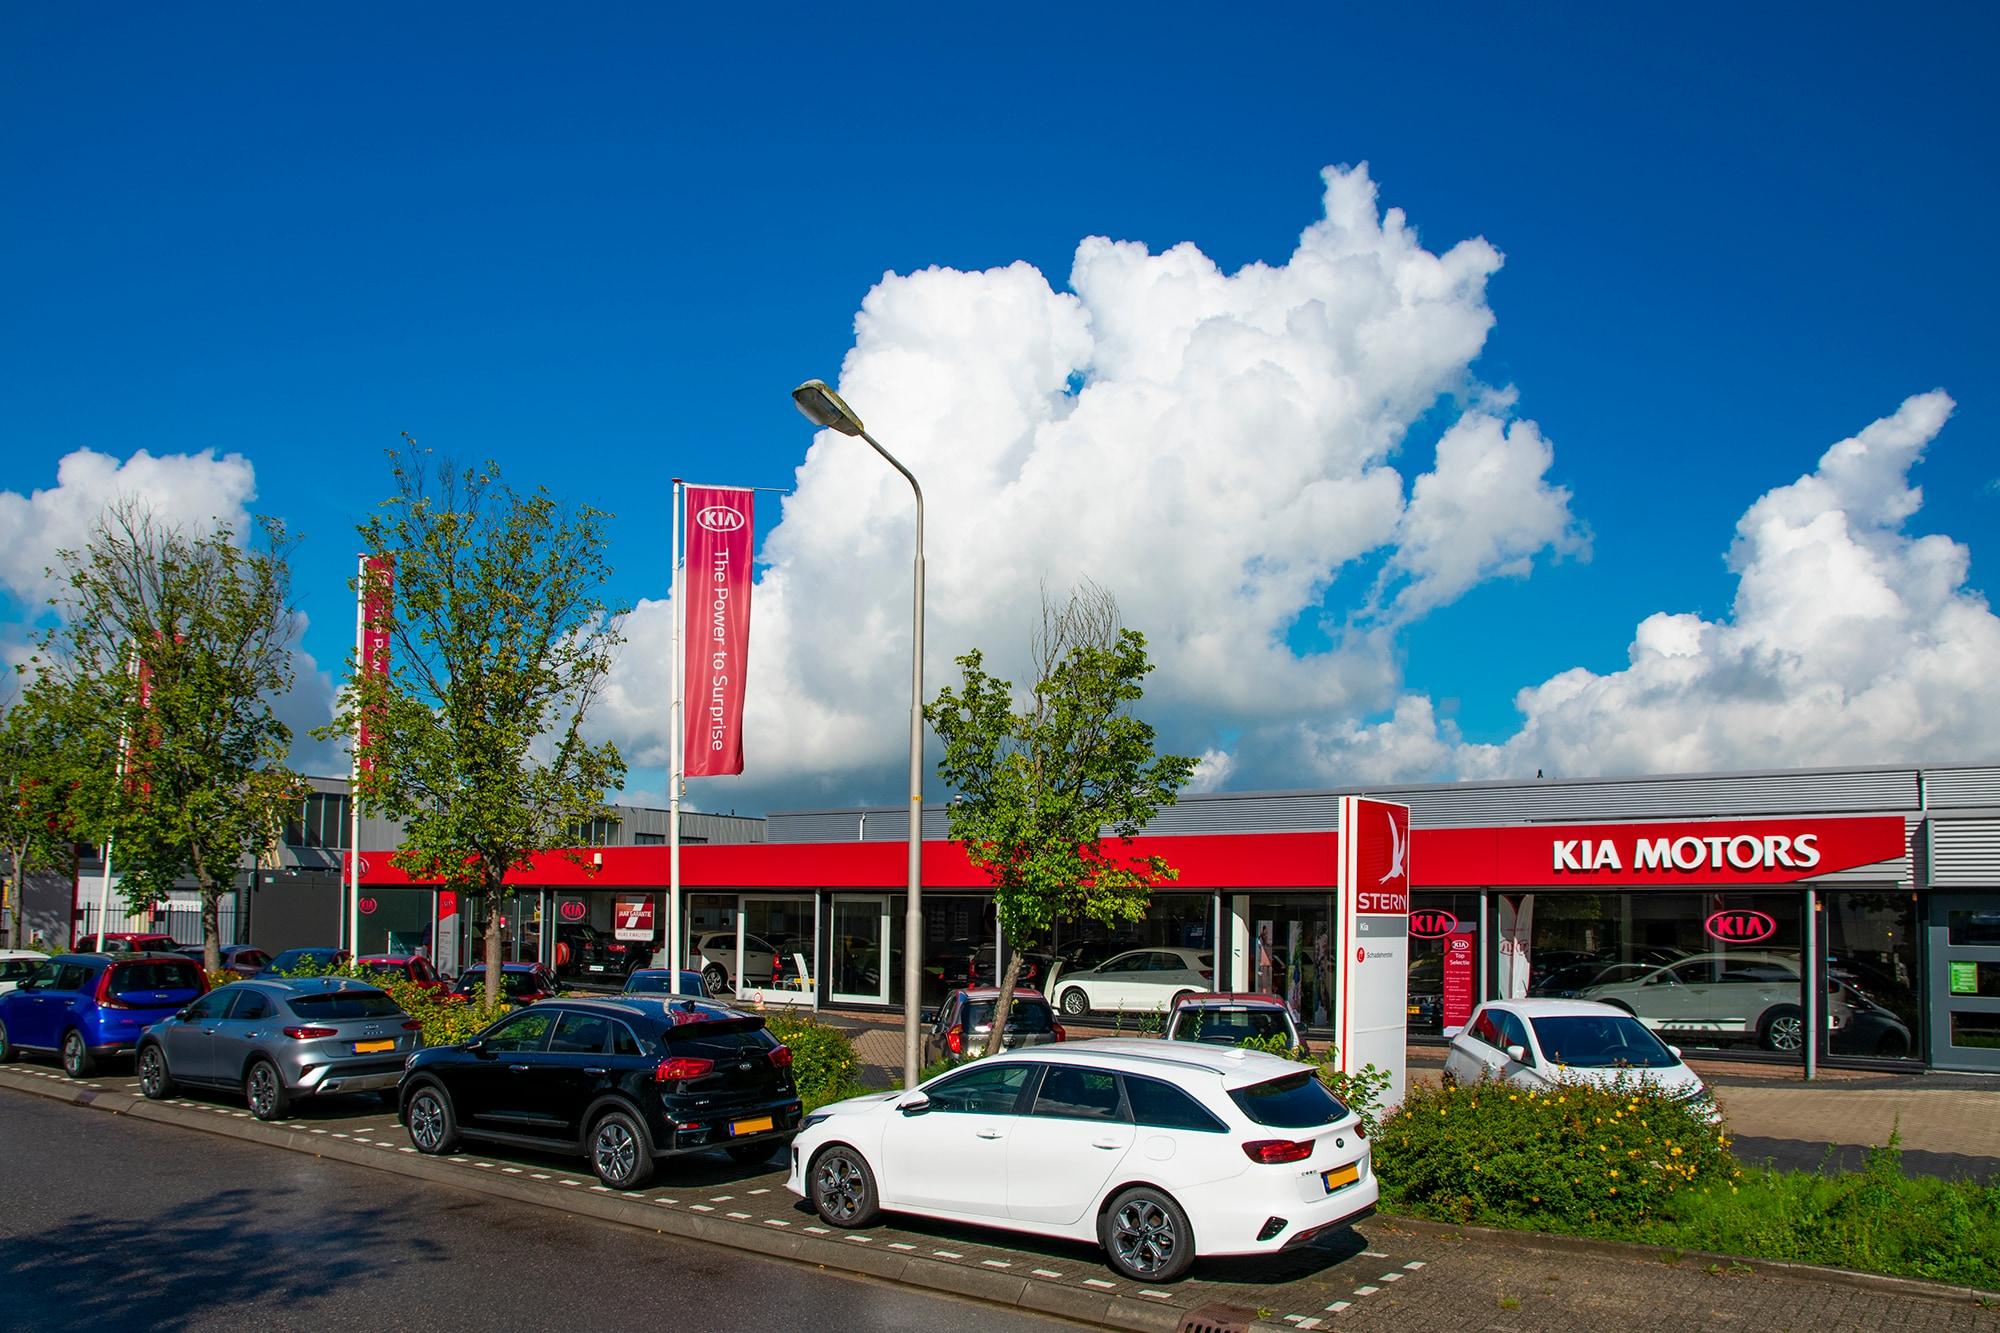 Kia-dealer Stern in Purmerend